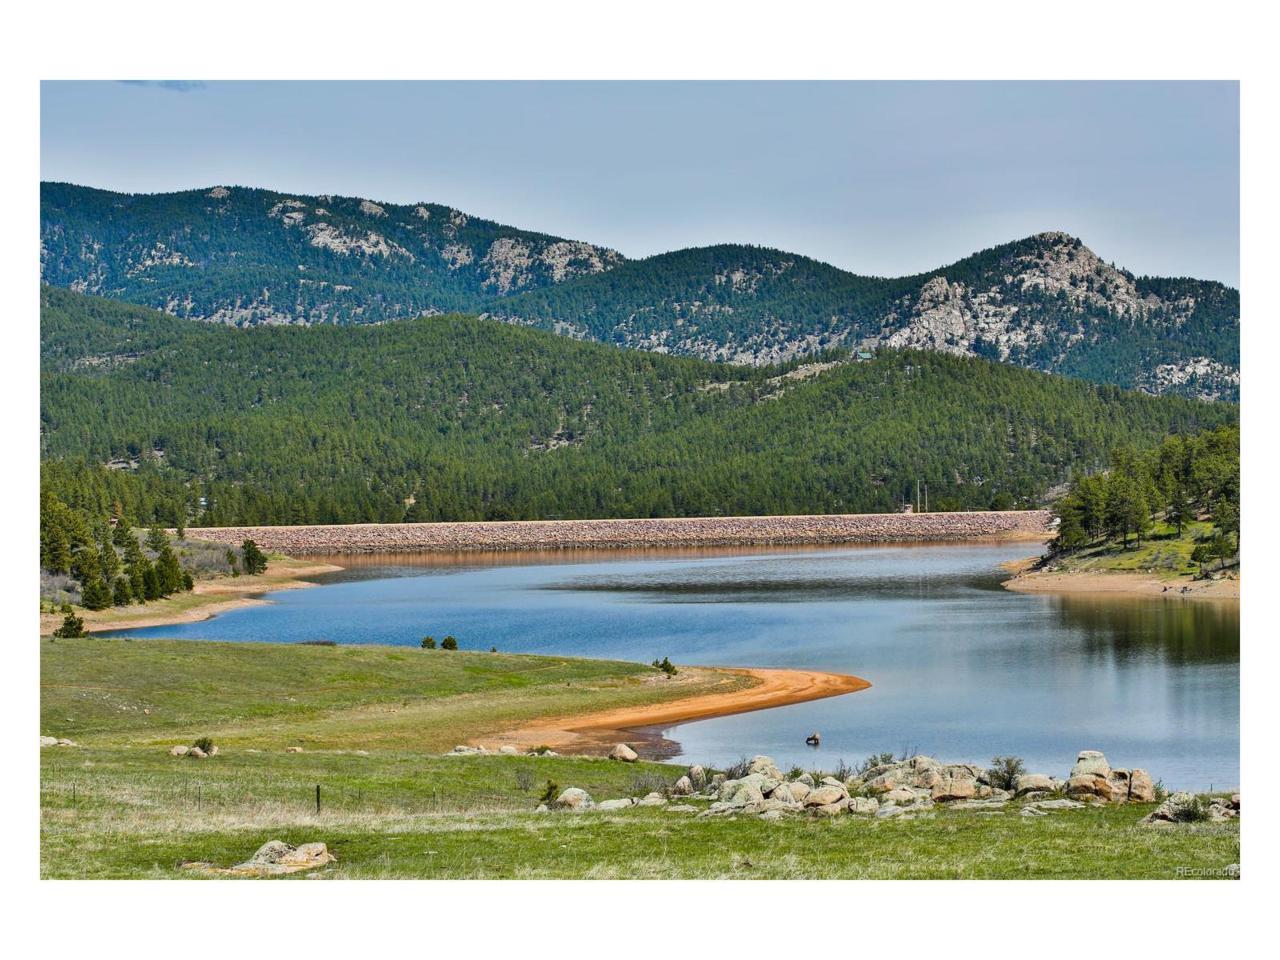 689 Cattle Drive Road, Loveland, CO 80537 (MLS #5185113) :: 8z Real Estate